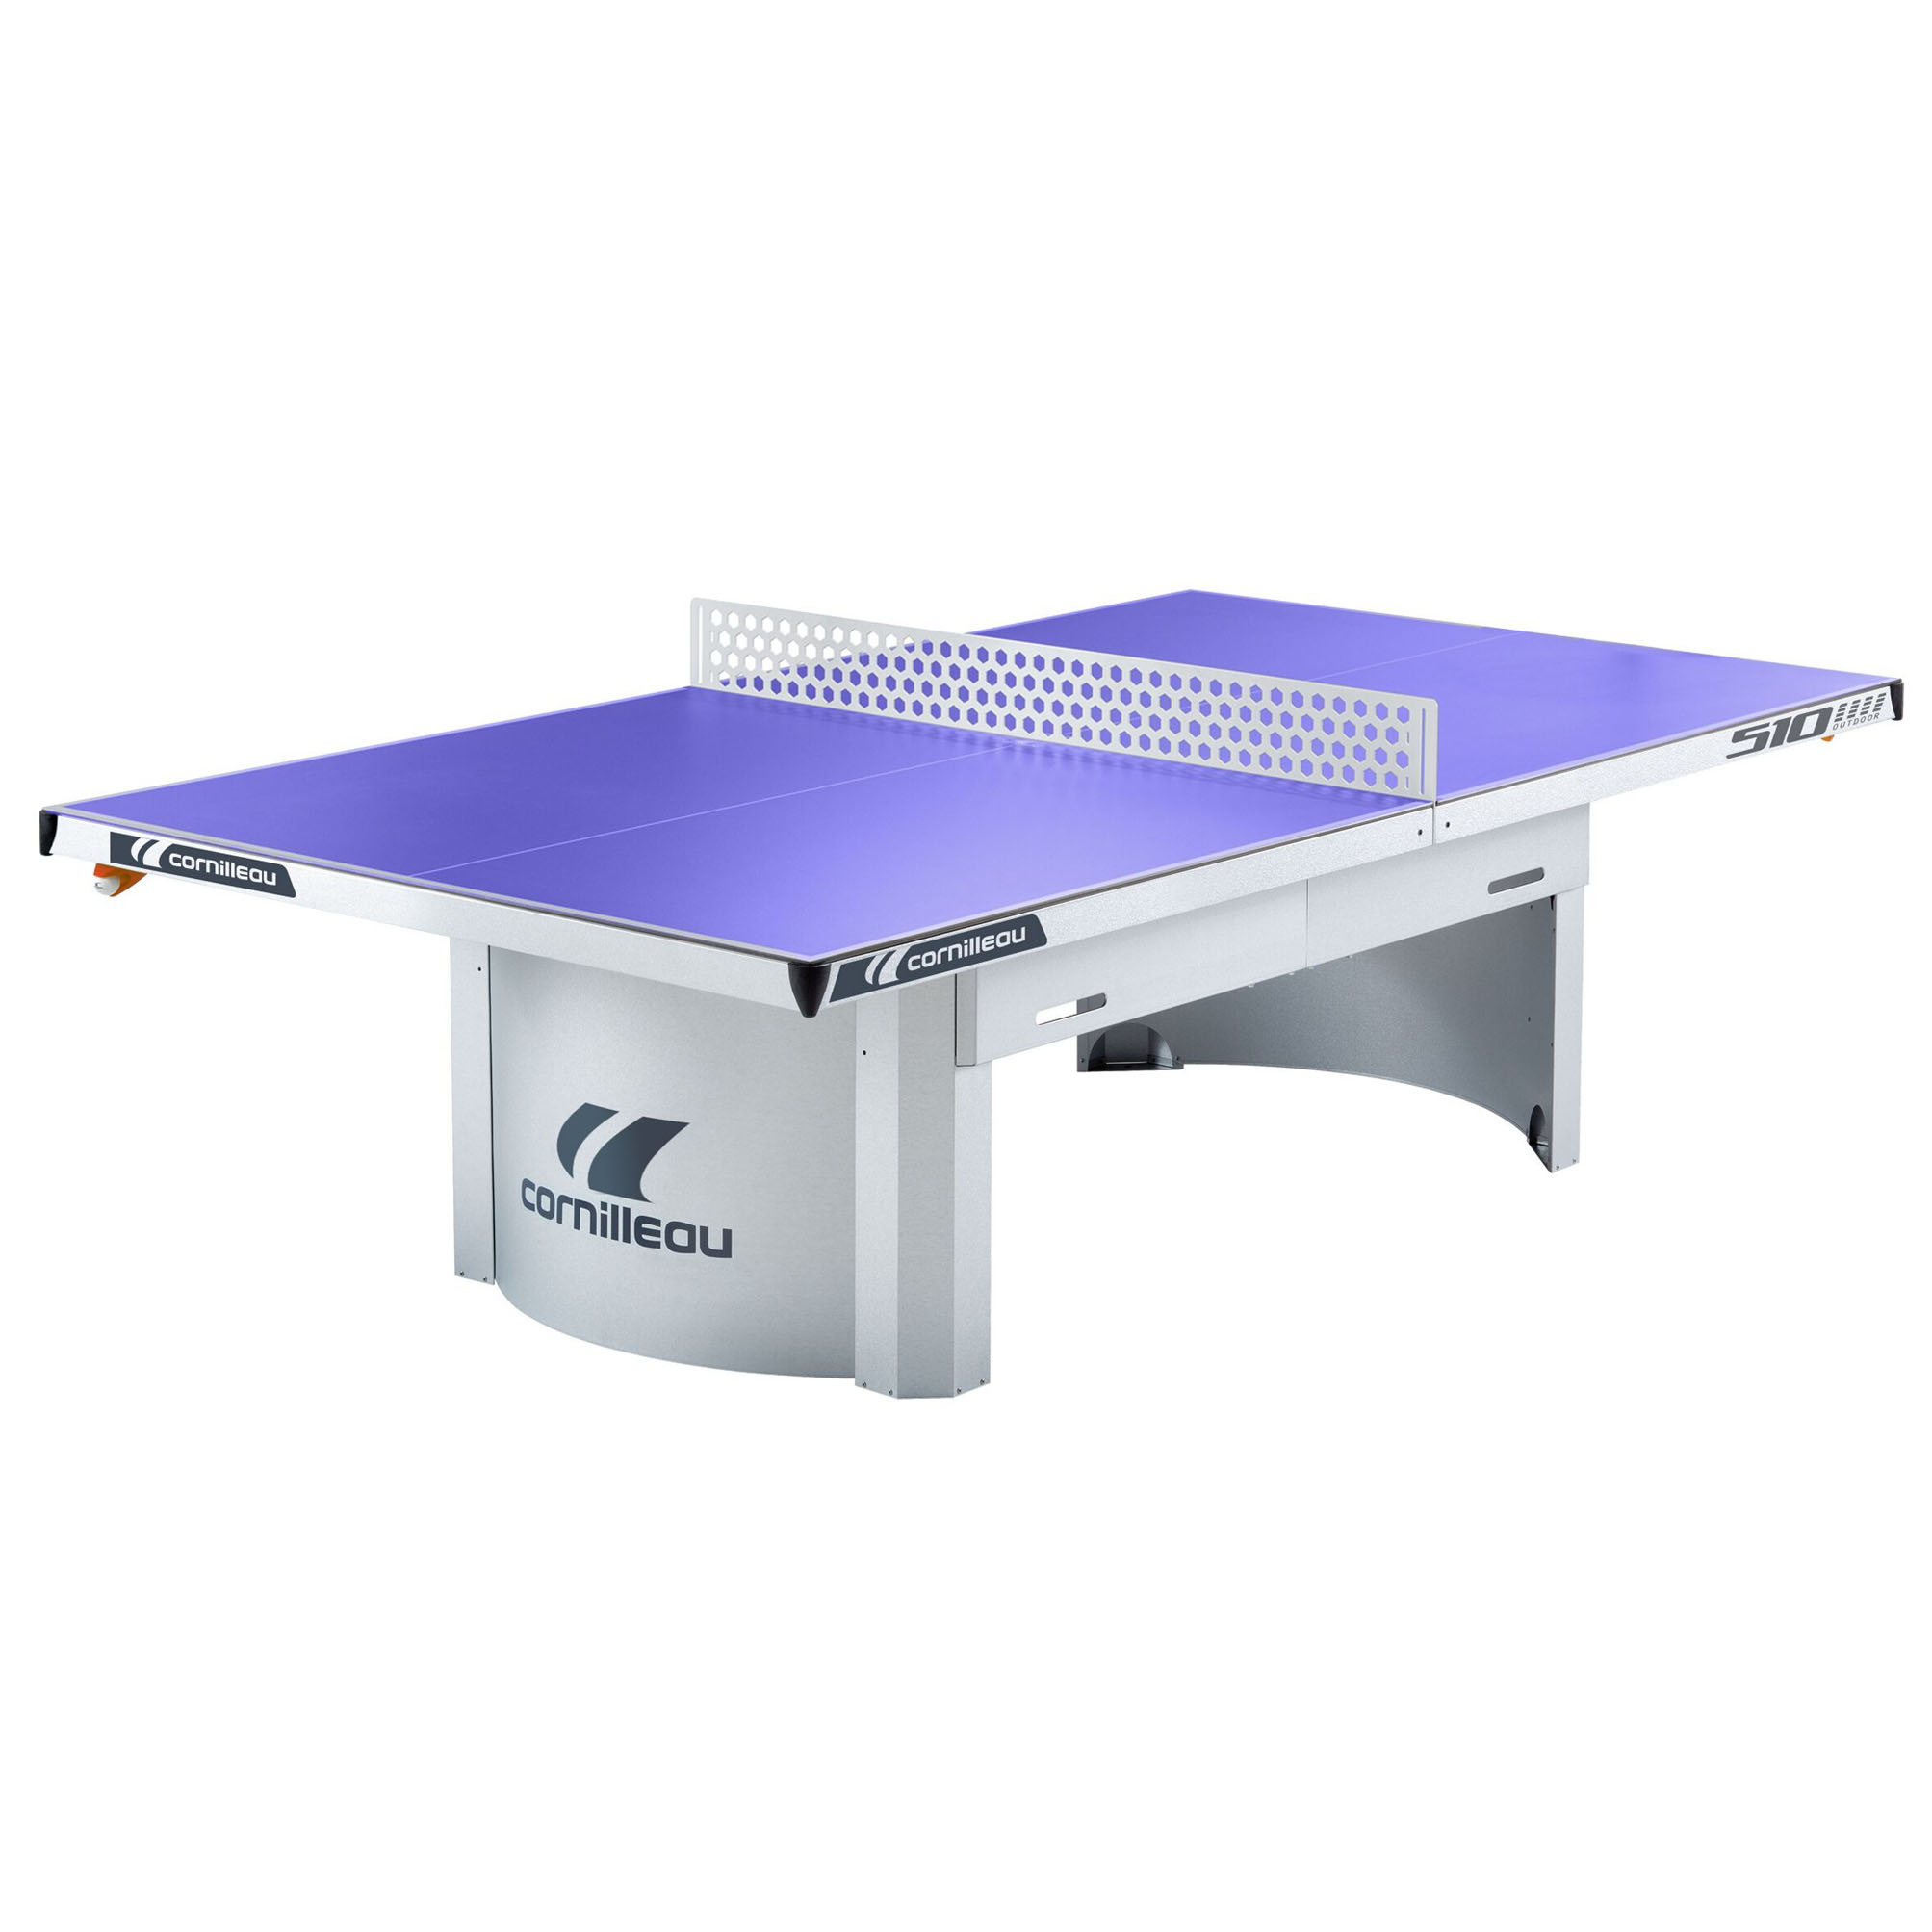 Cornilleau Proline 510 Static Outdoor Table Tennis Table  Blue